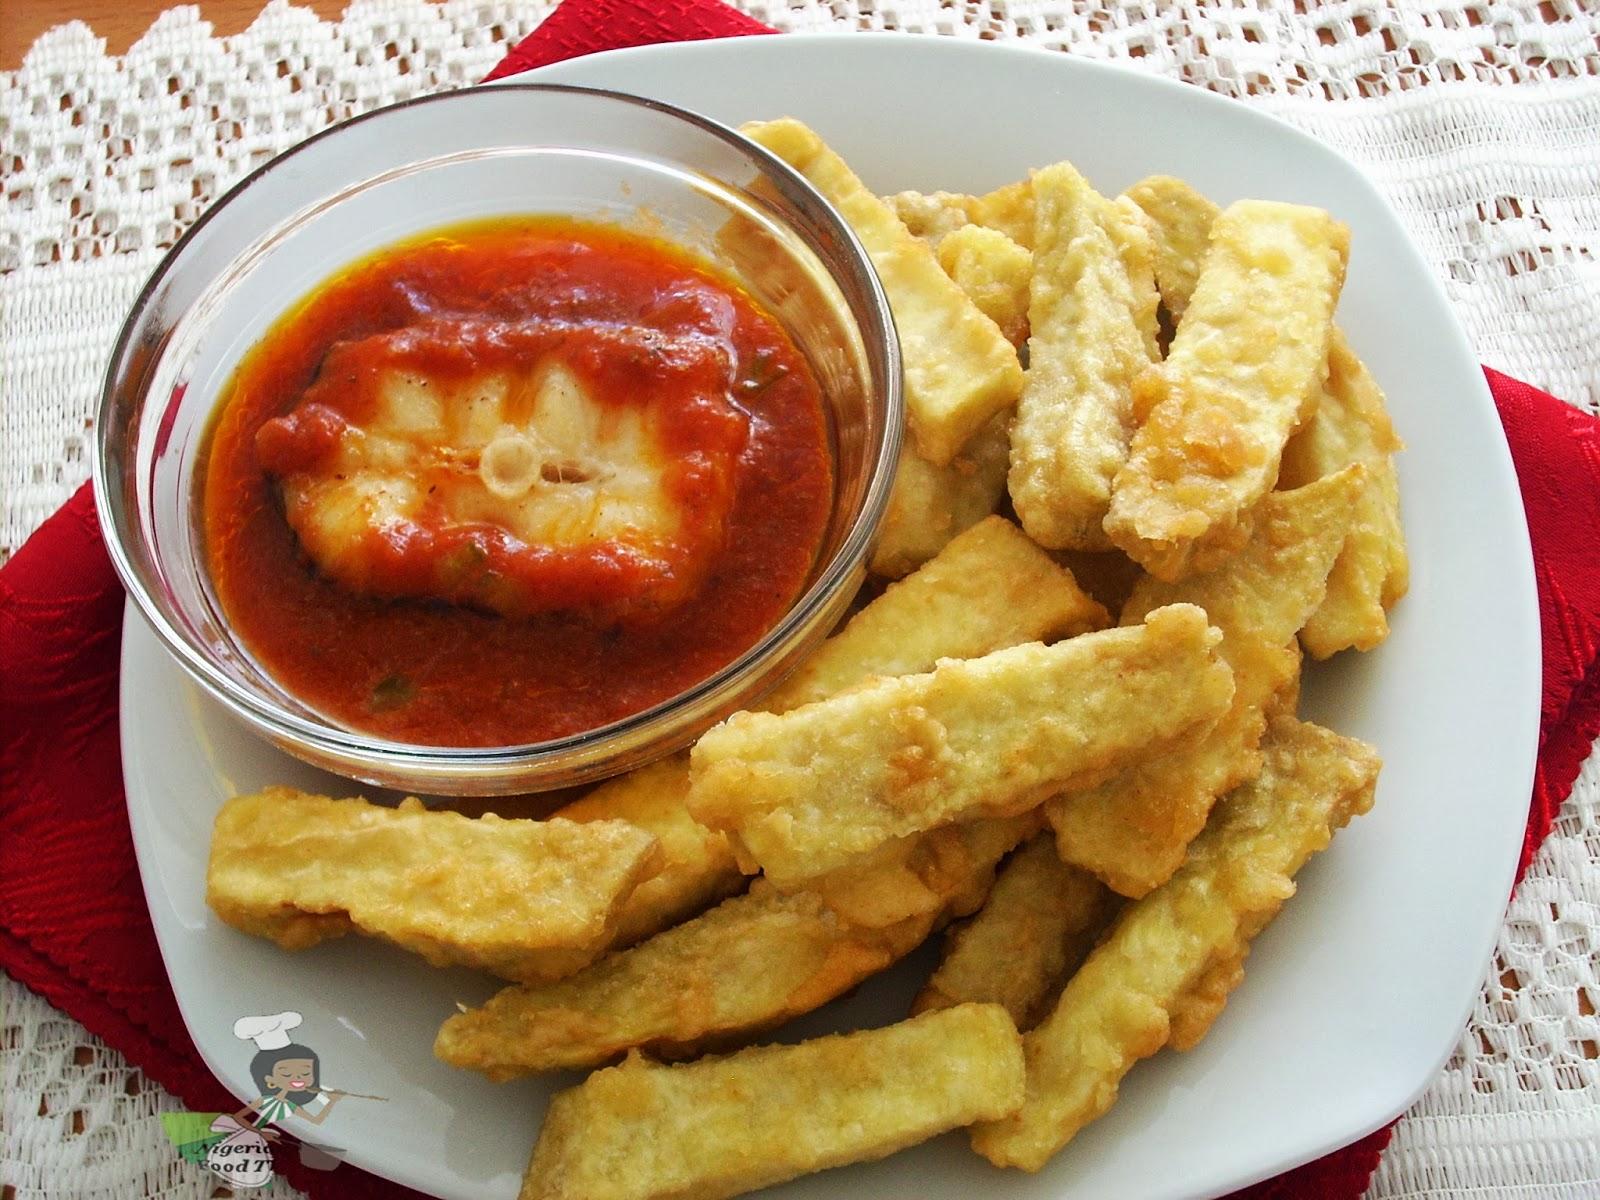 Dun Dun Oniyeri (Egg Coated Yam Fries